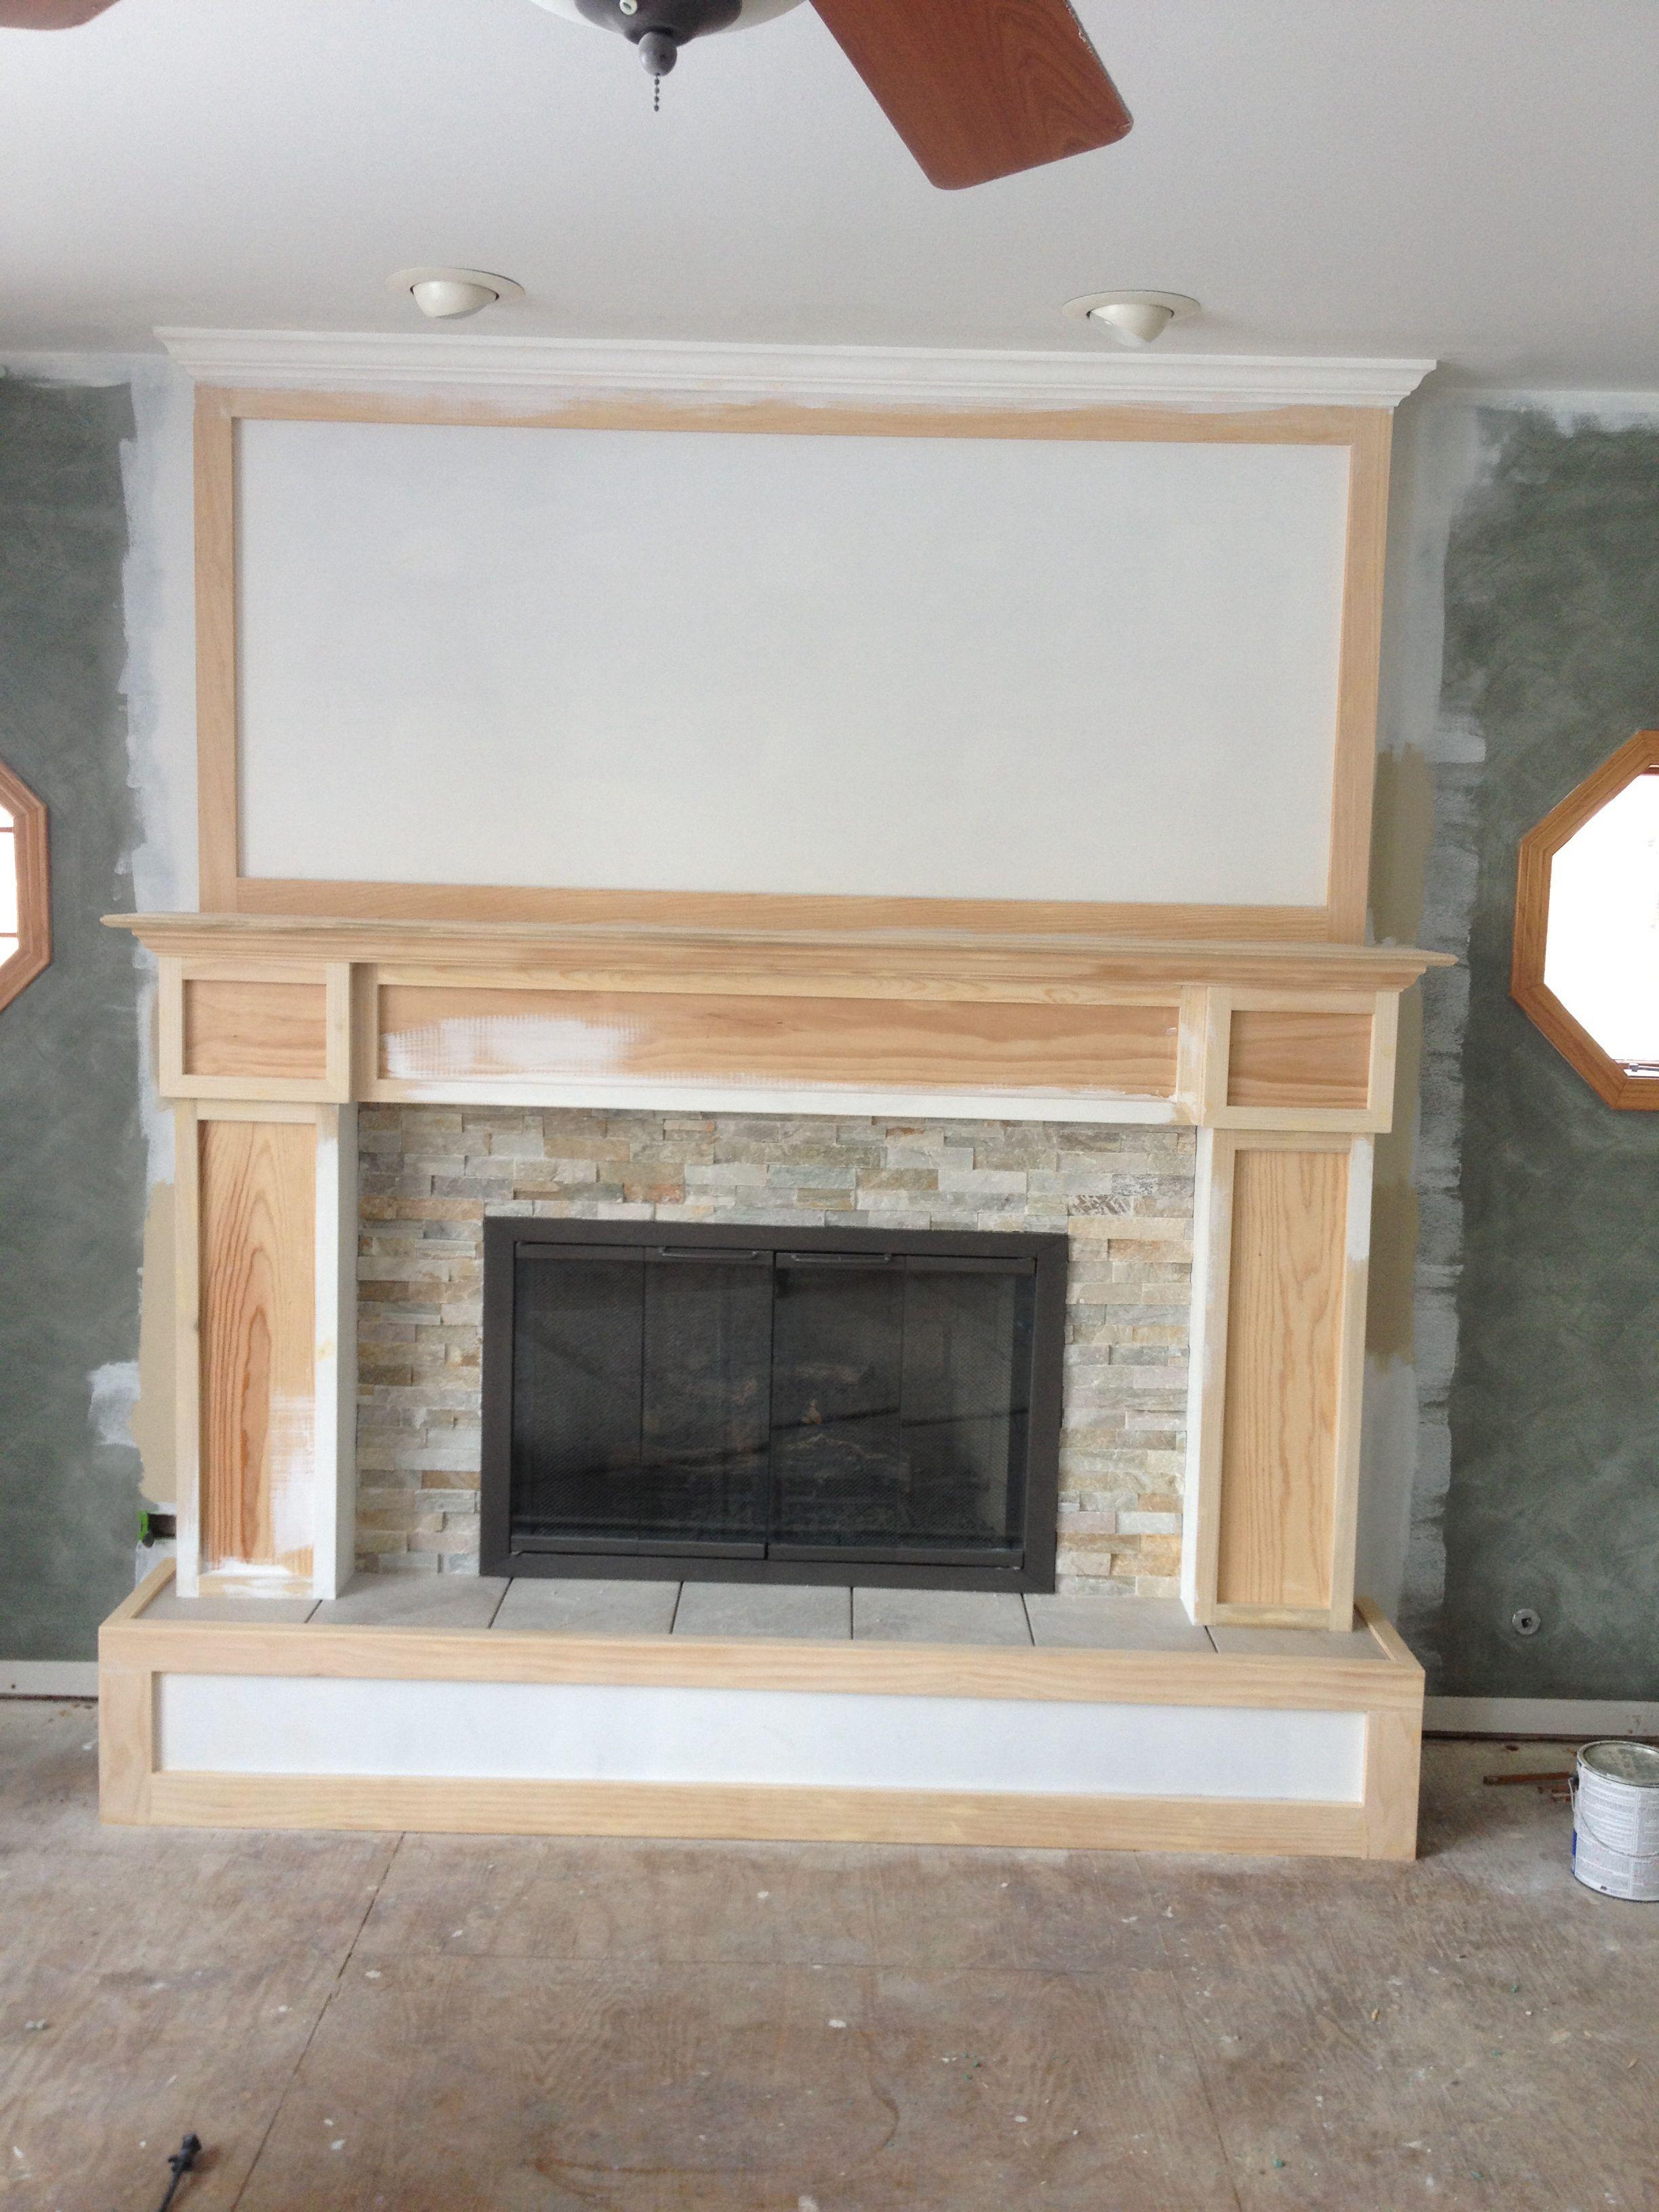 Step 6 Install Fireplace Surround We Used Desert Quartz